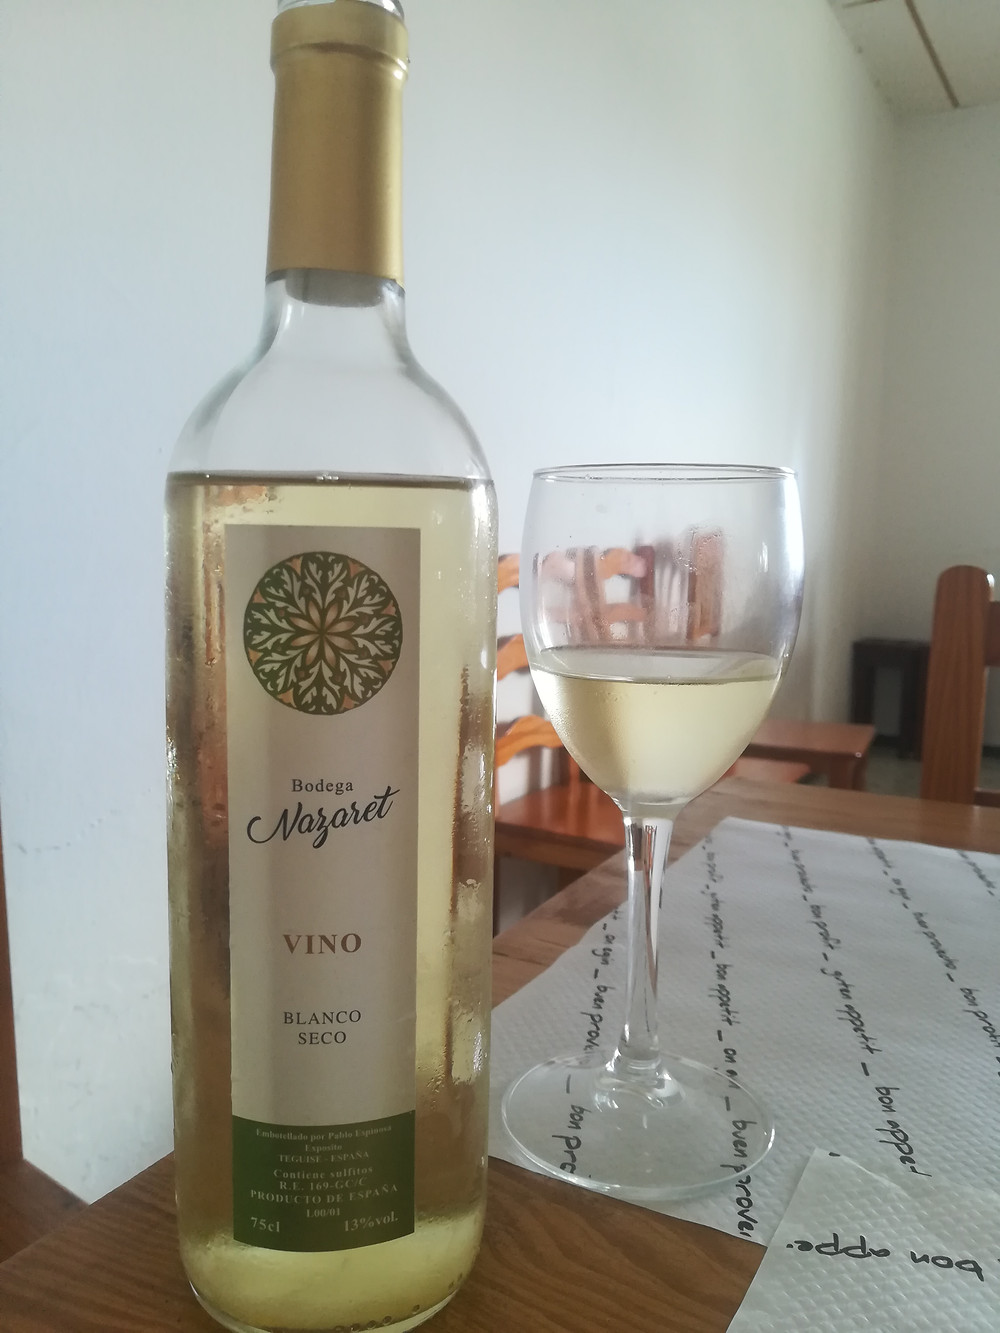 New Lanzarote wine